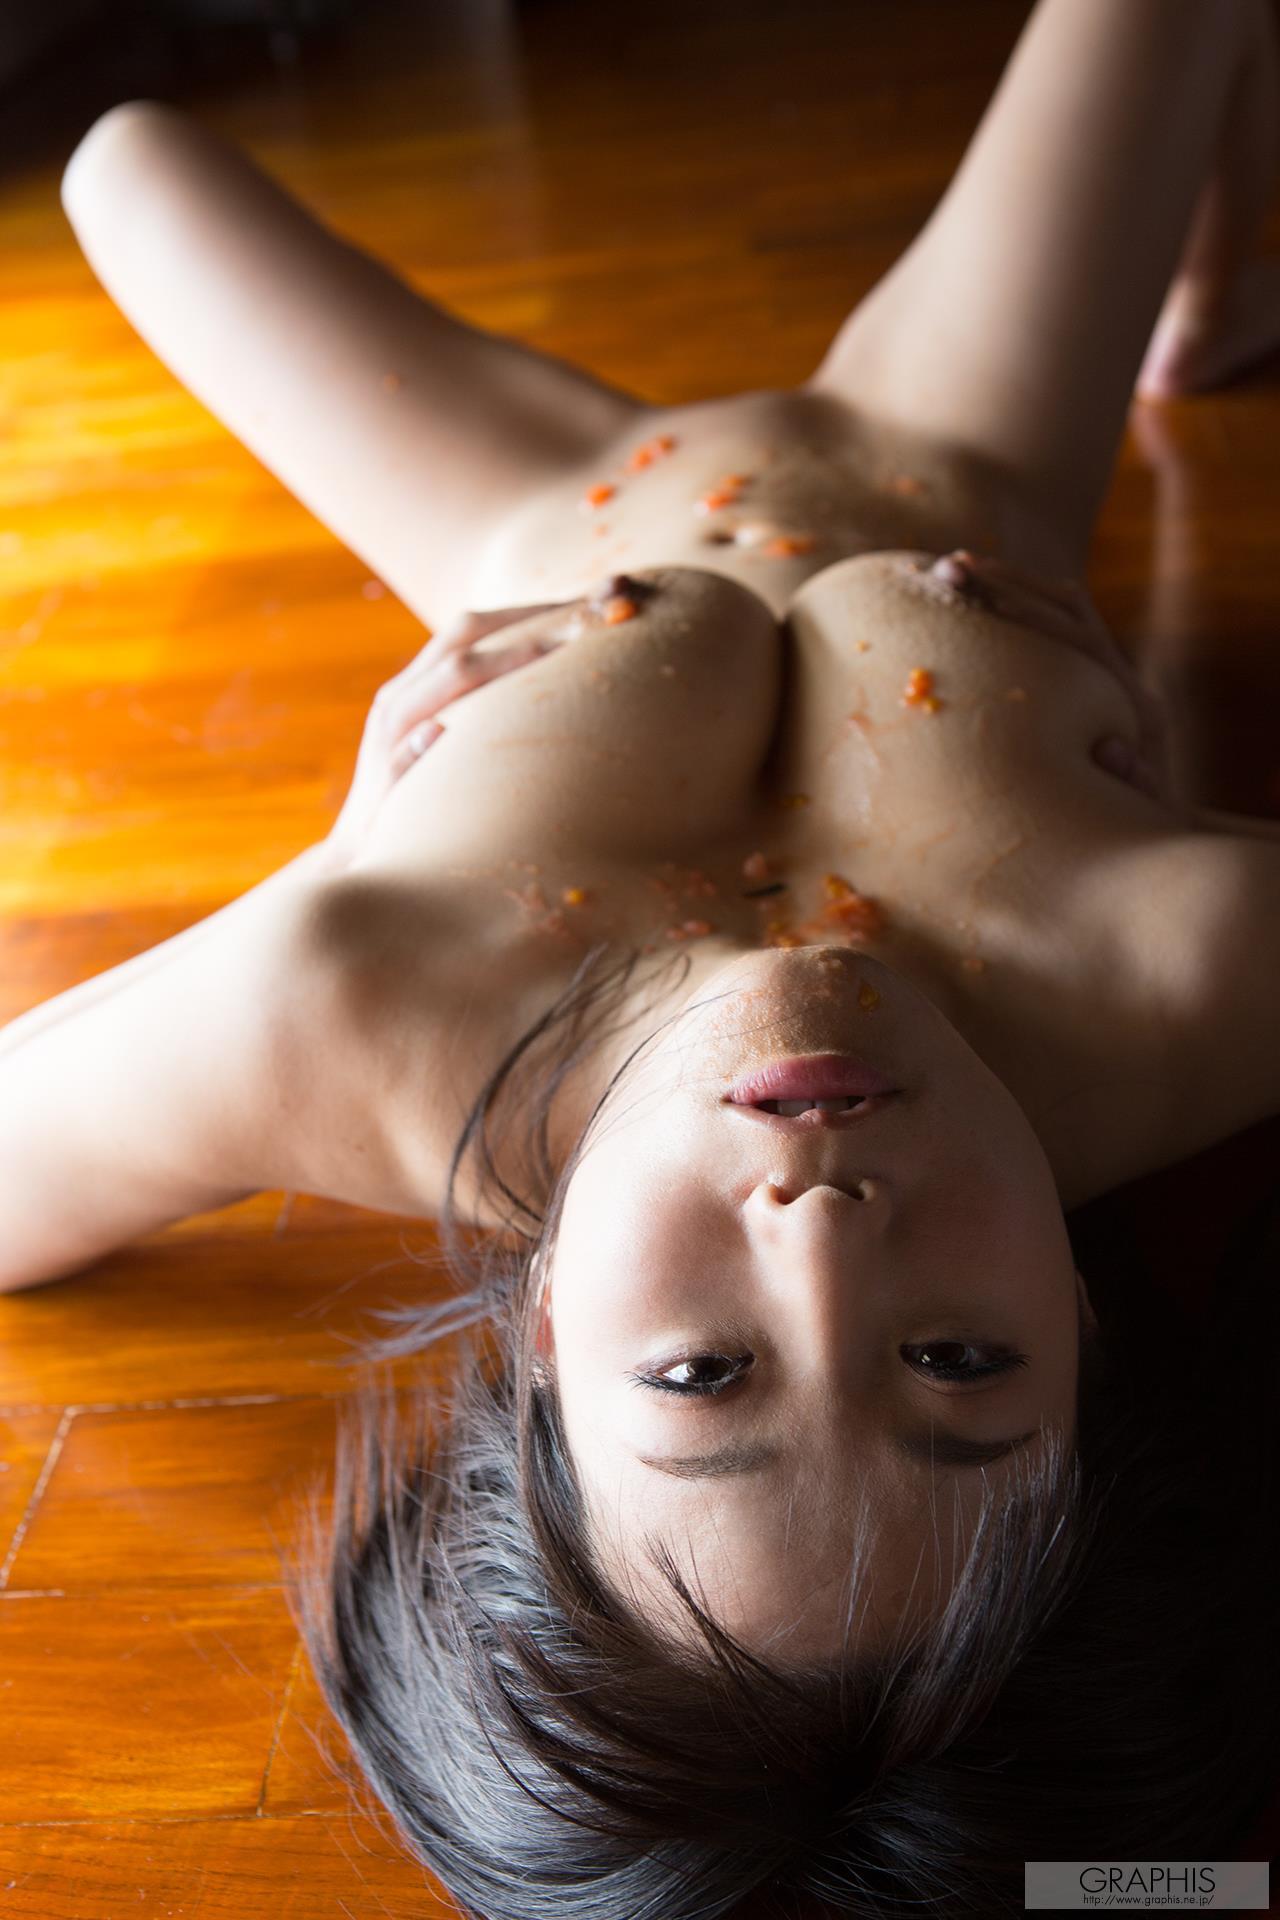 gra_kaho-s048.jpg